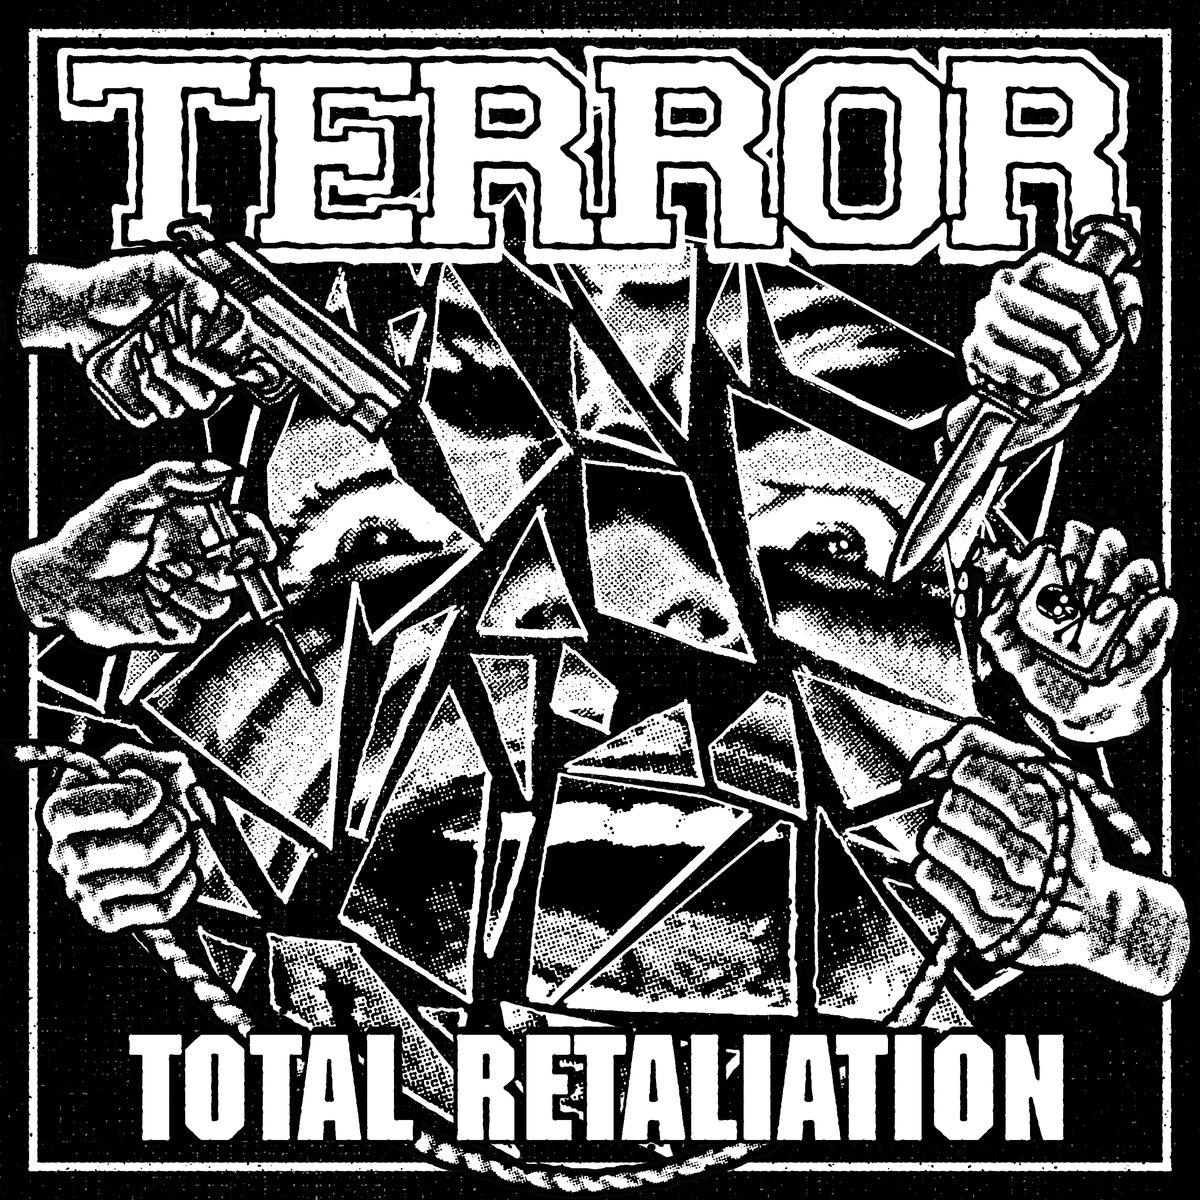 TERROR Total Retaliation